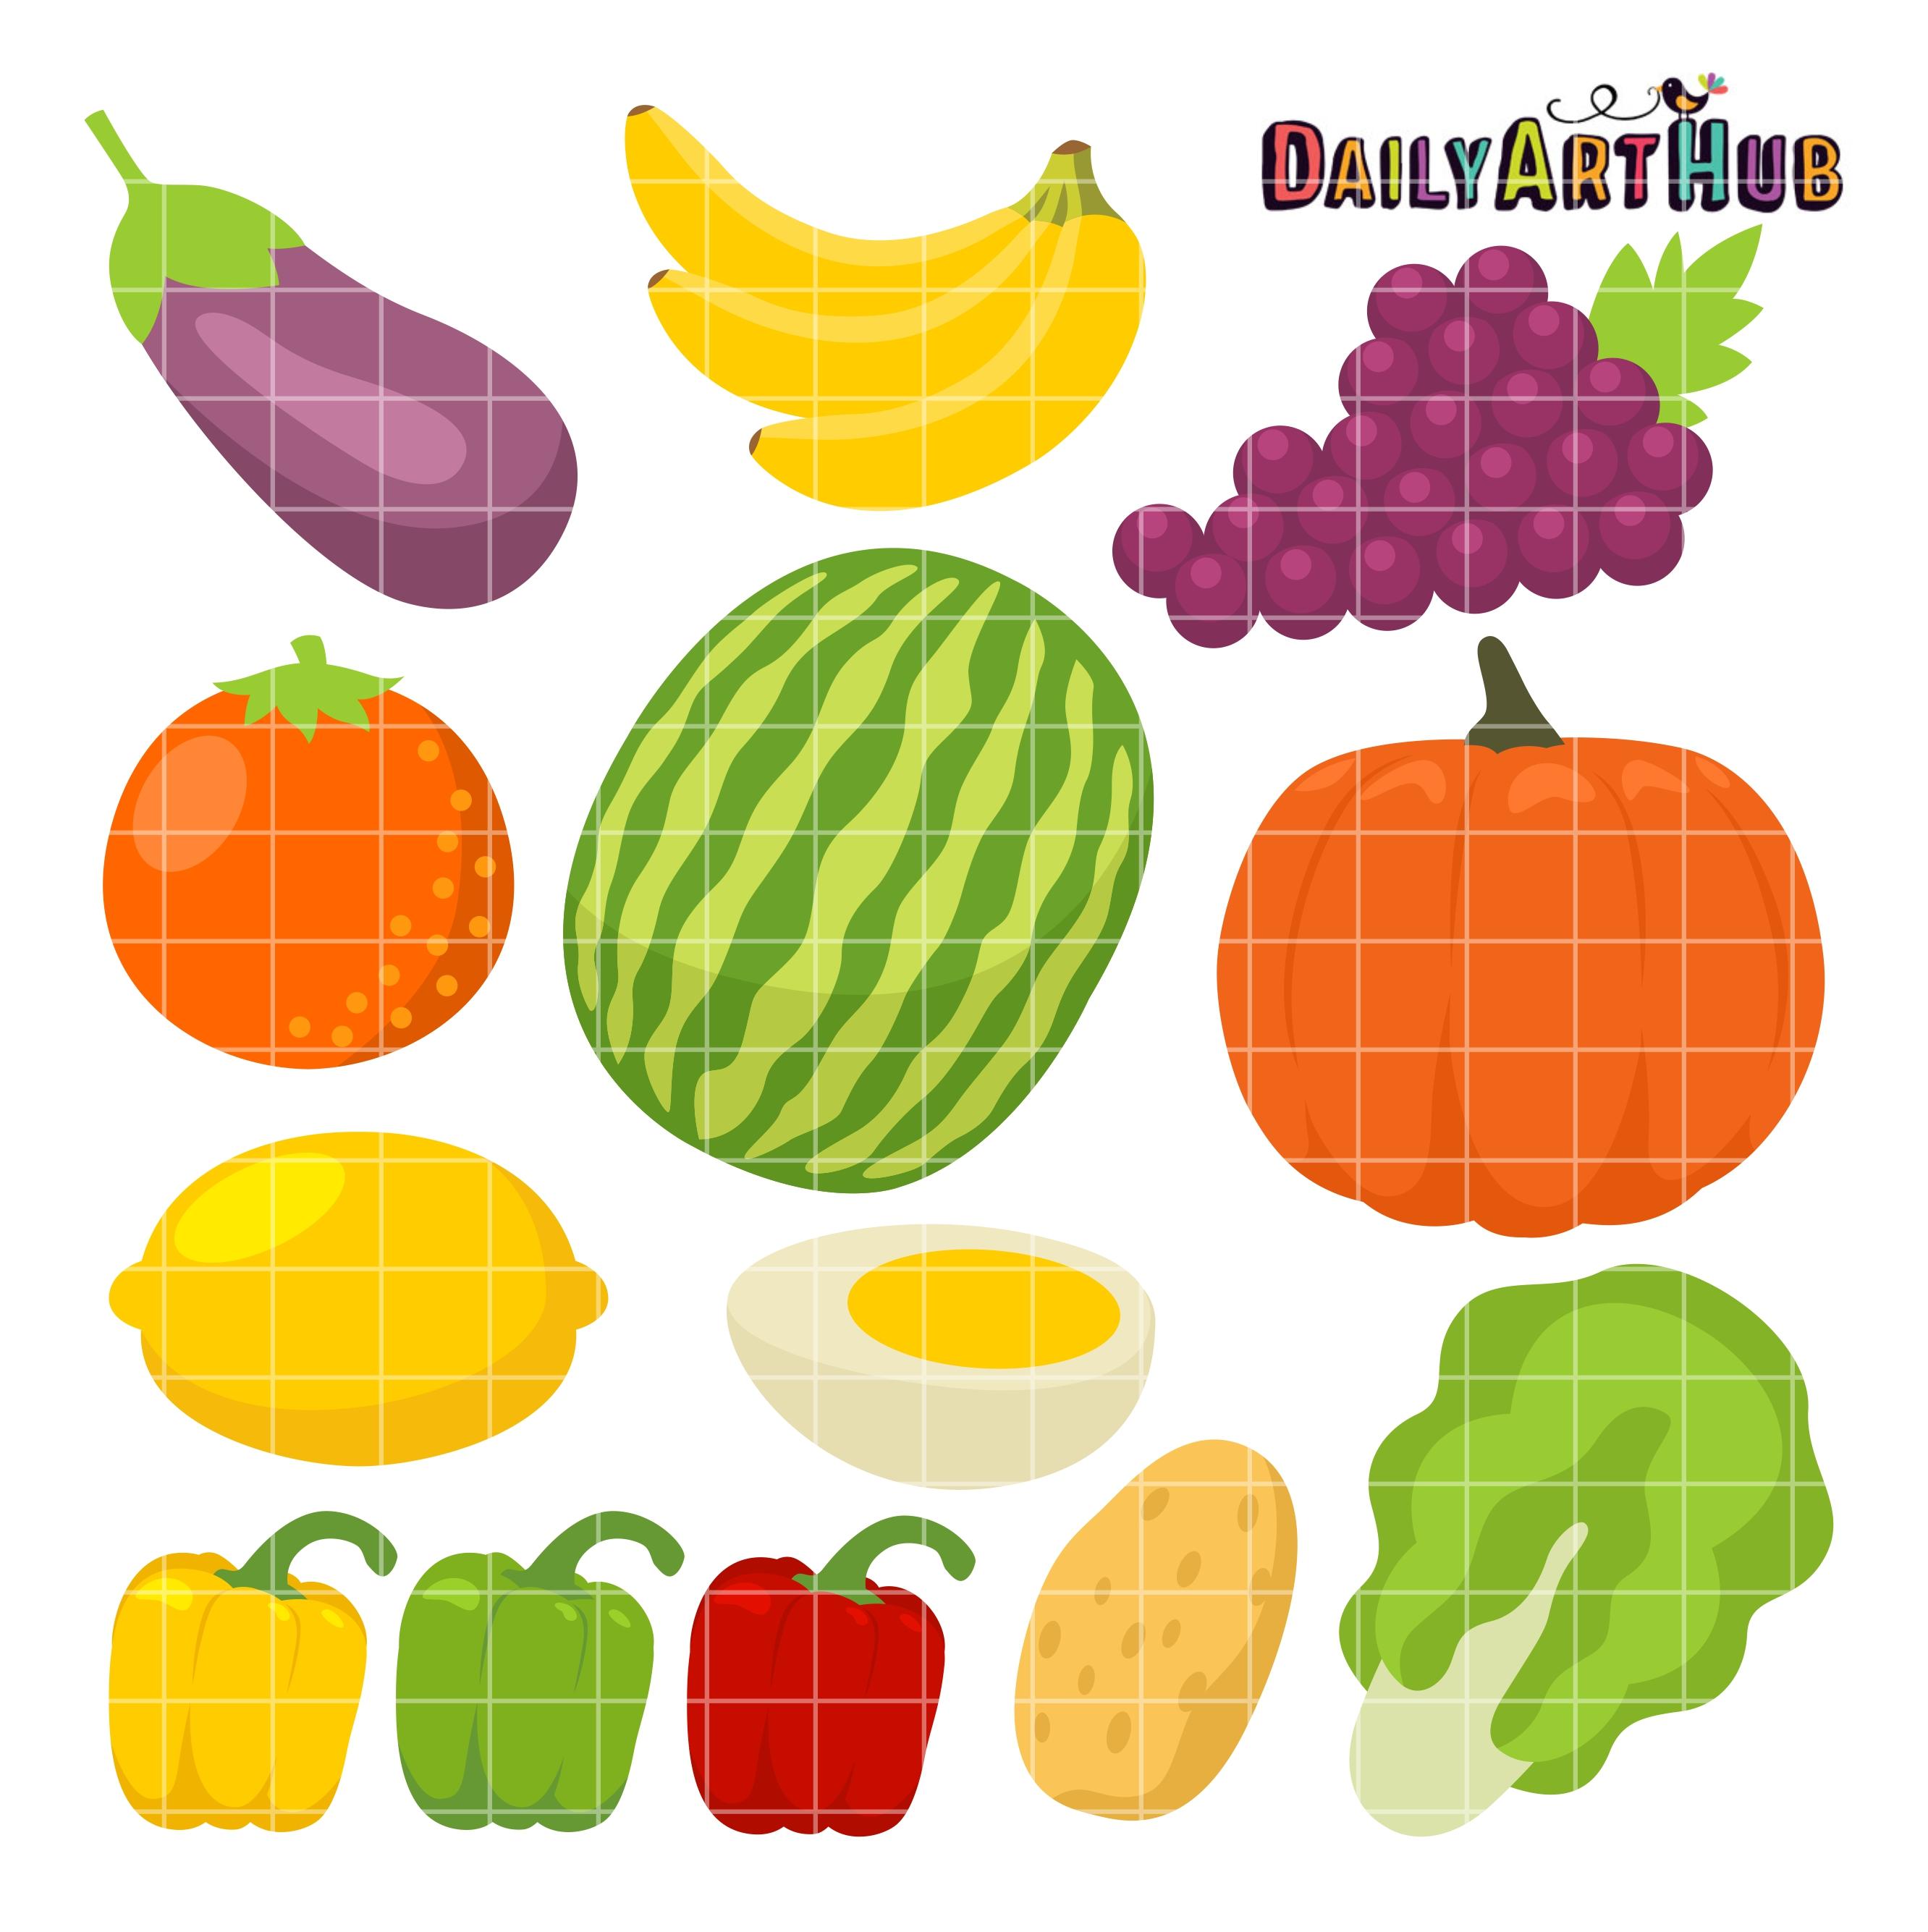 healthy foods clip art set daily art hub healthy food clip art kids healthy food clipart for colouring